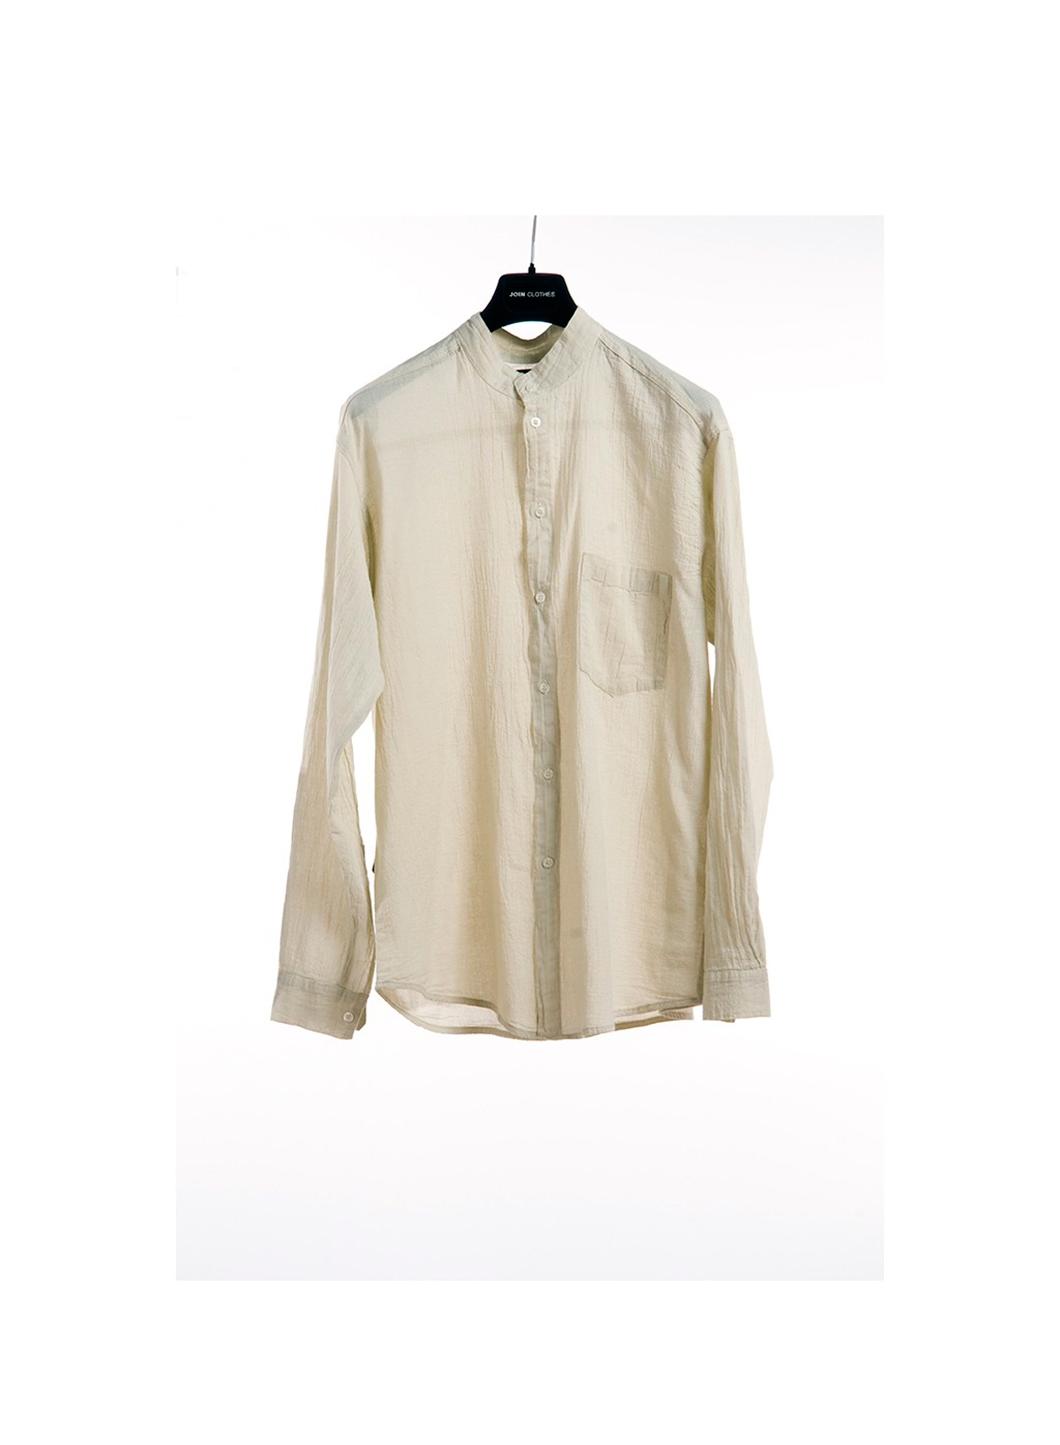 Shirt mao collar gauze long sleeve 100 cotton for Long sleeve 100 cotton shirts